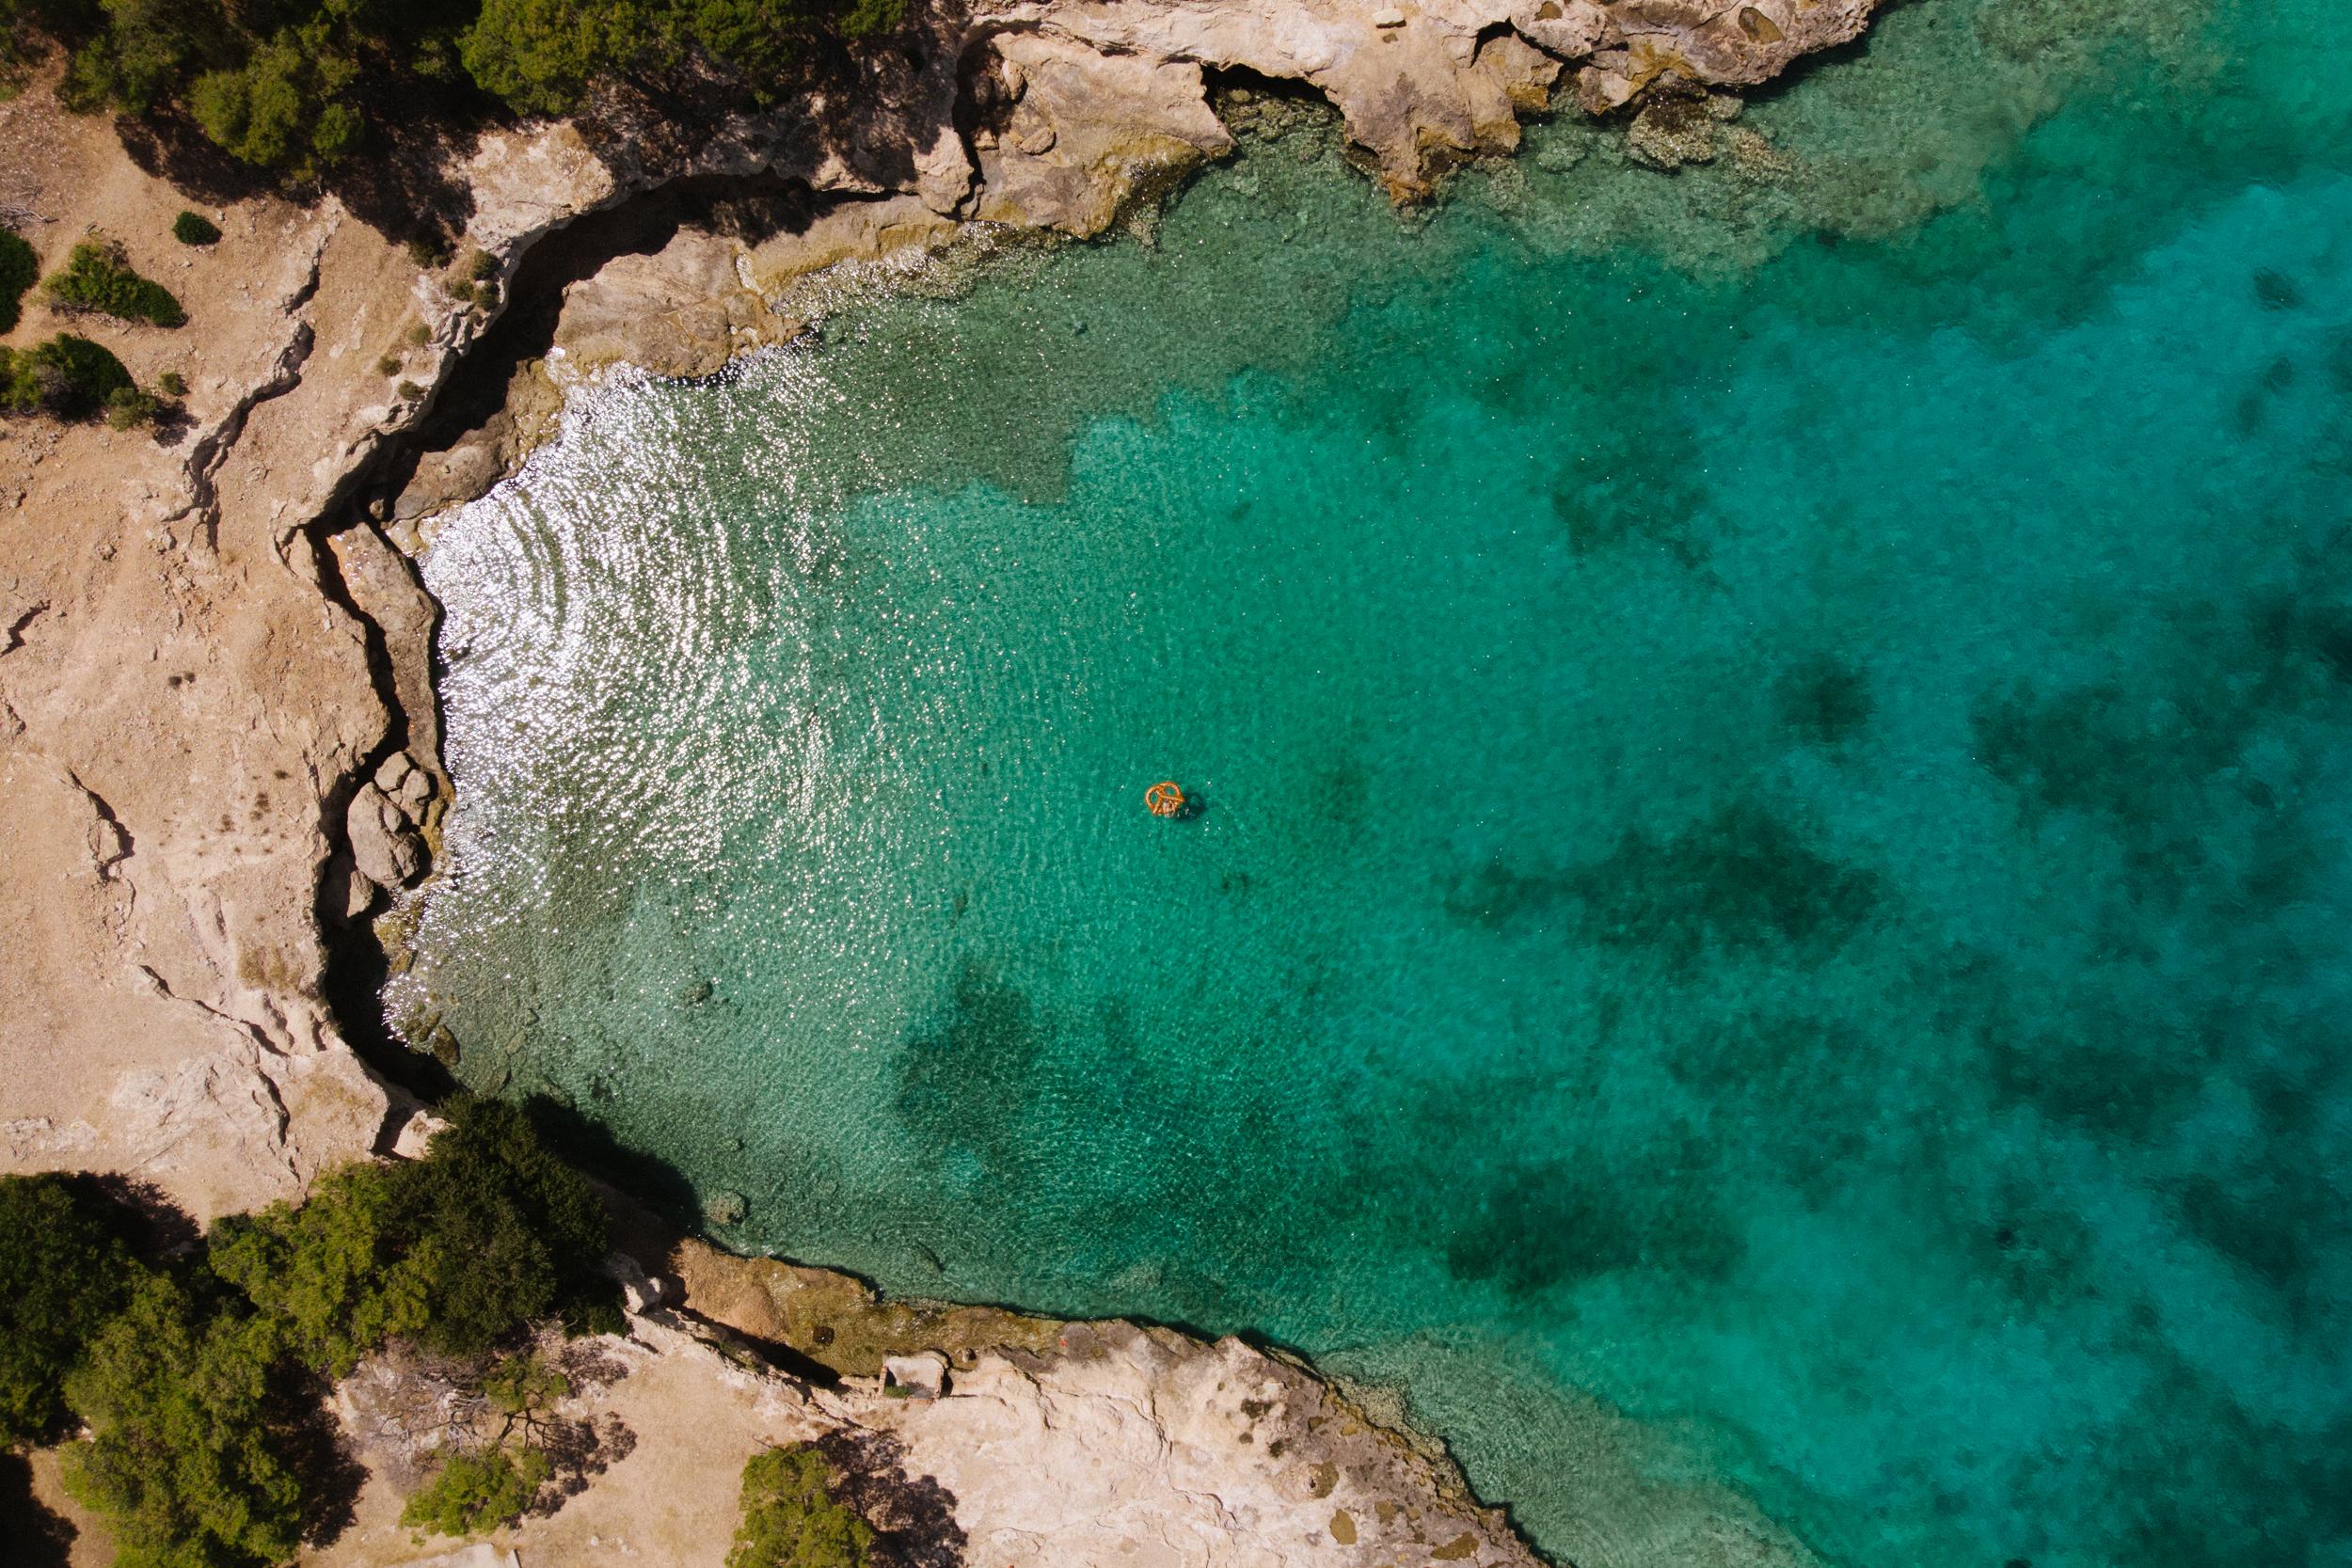 greece_2018_drone-10.jpg